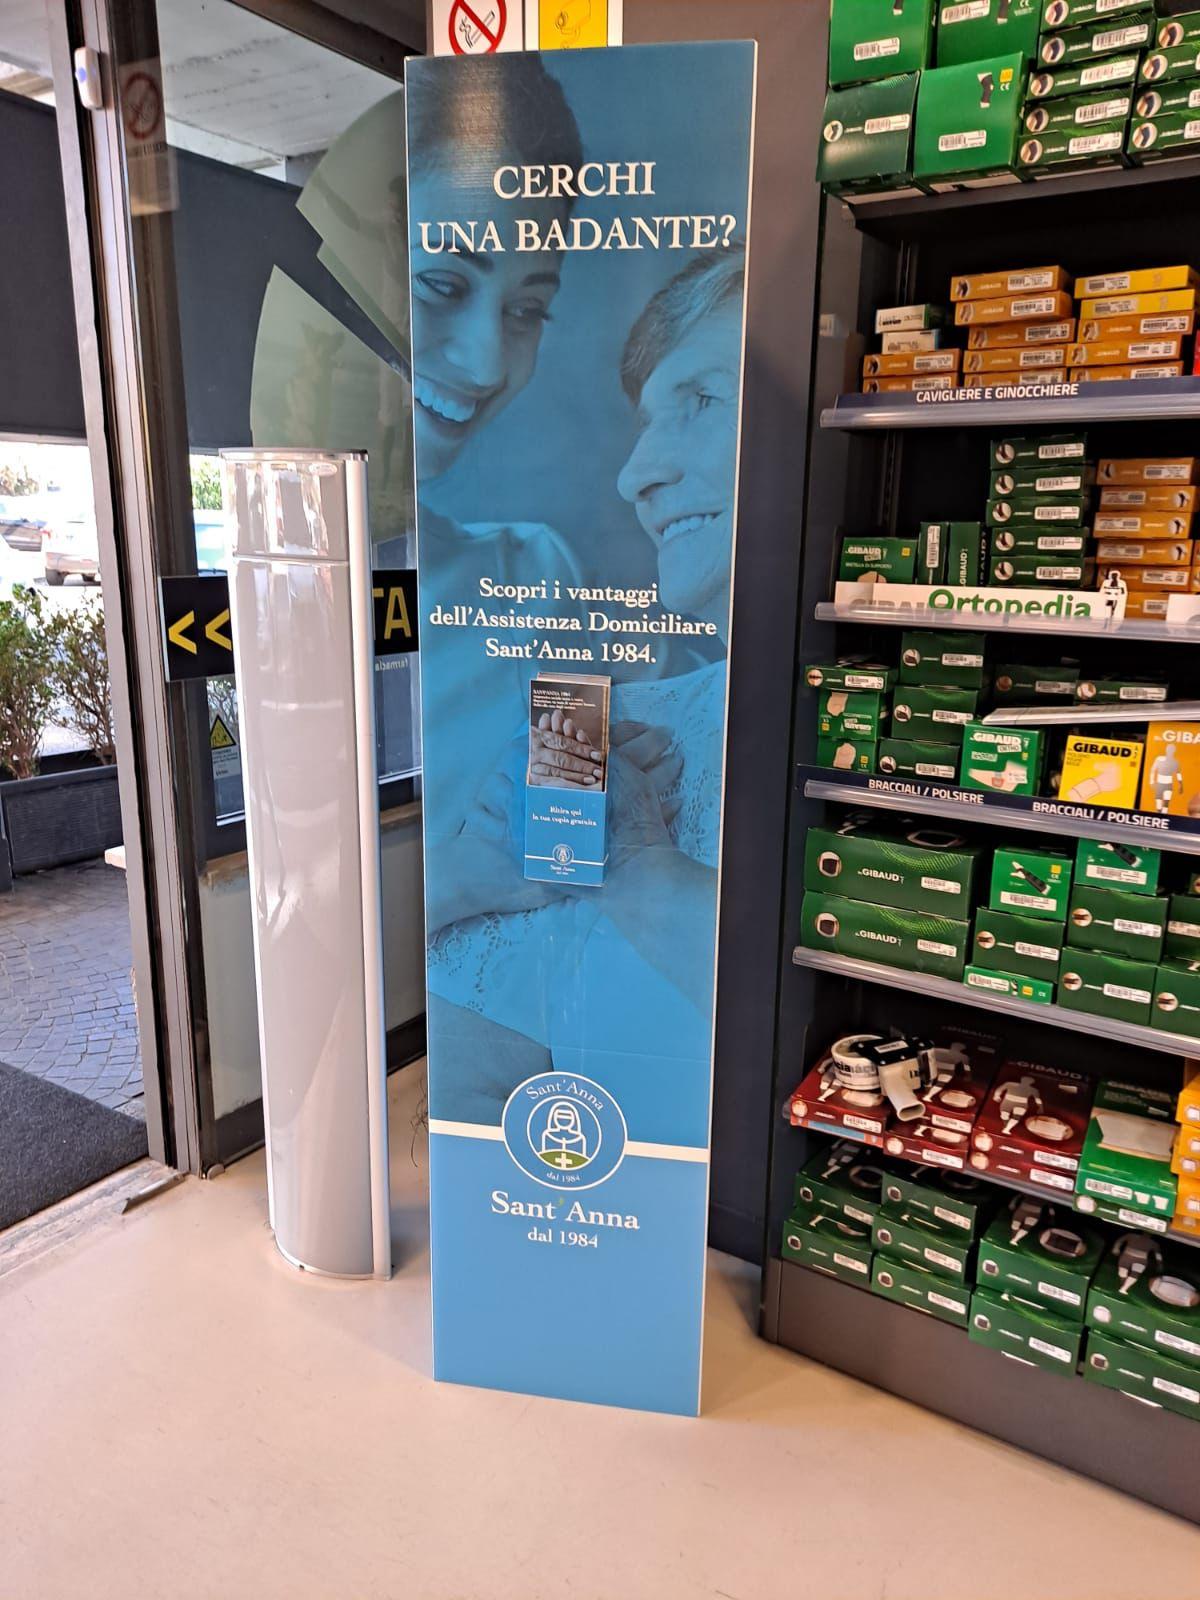 Farmacia San Giorgio - Via Amsterdam, 78